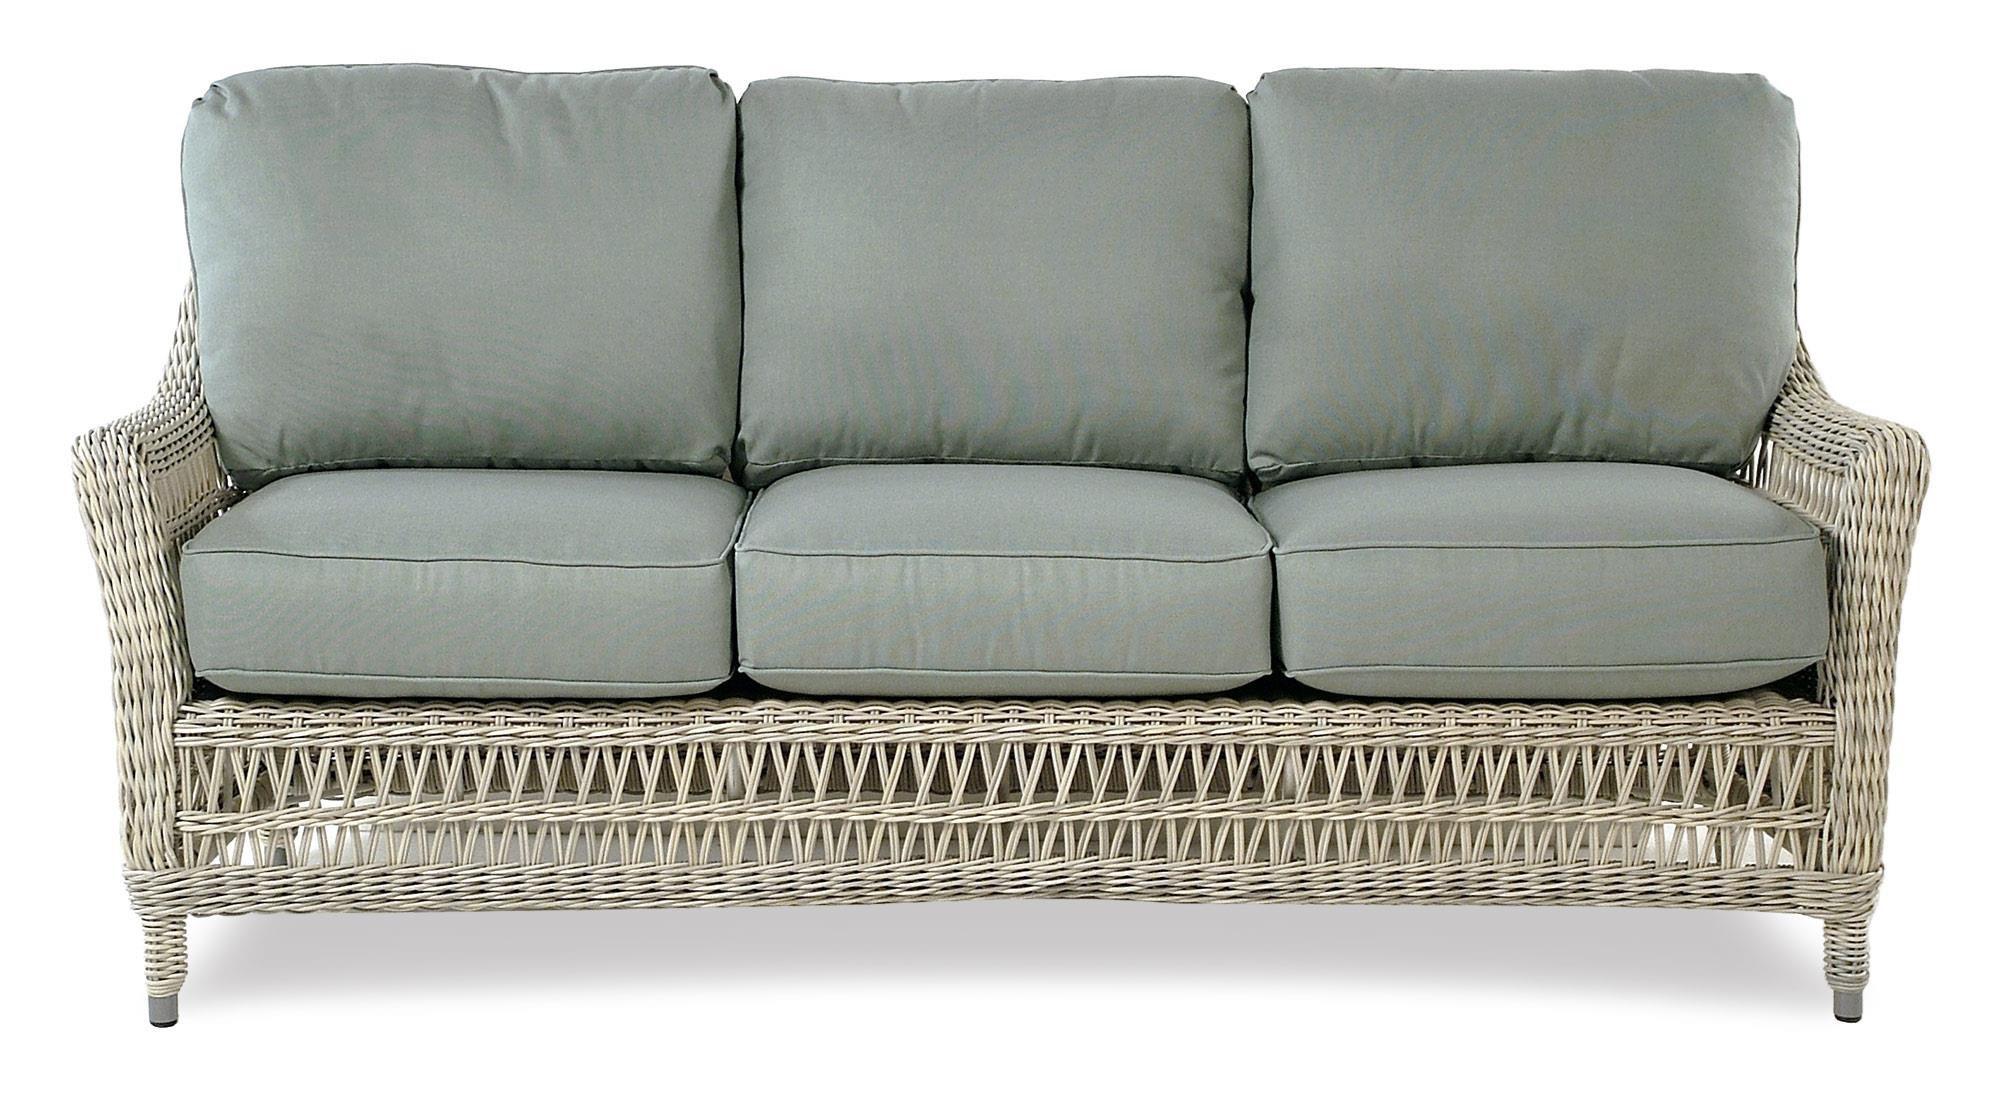 Outdoor/Patio Sofa